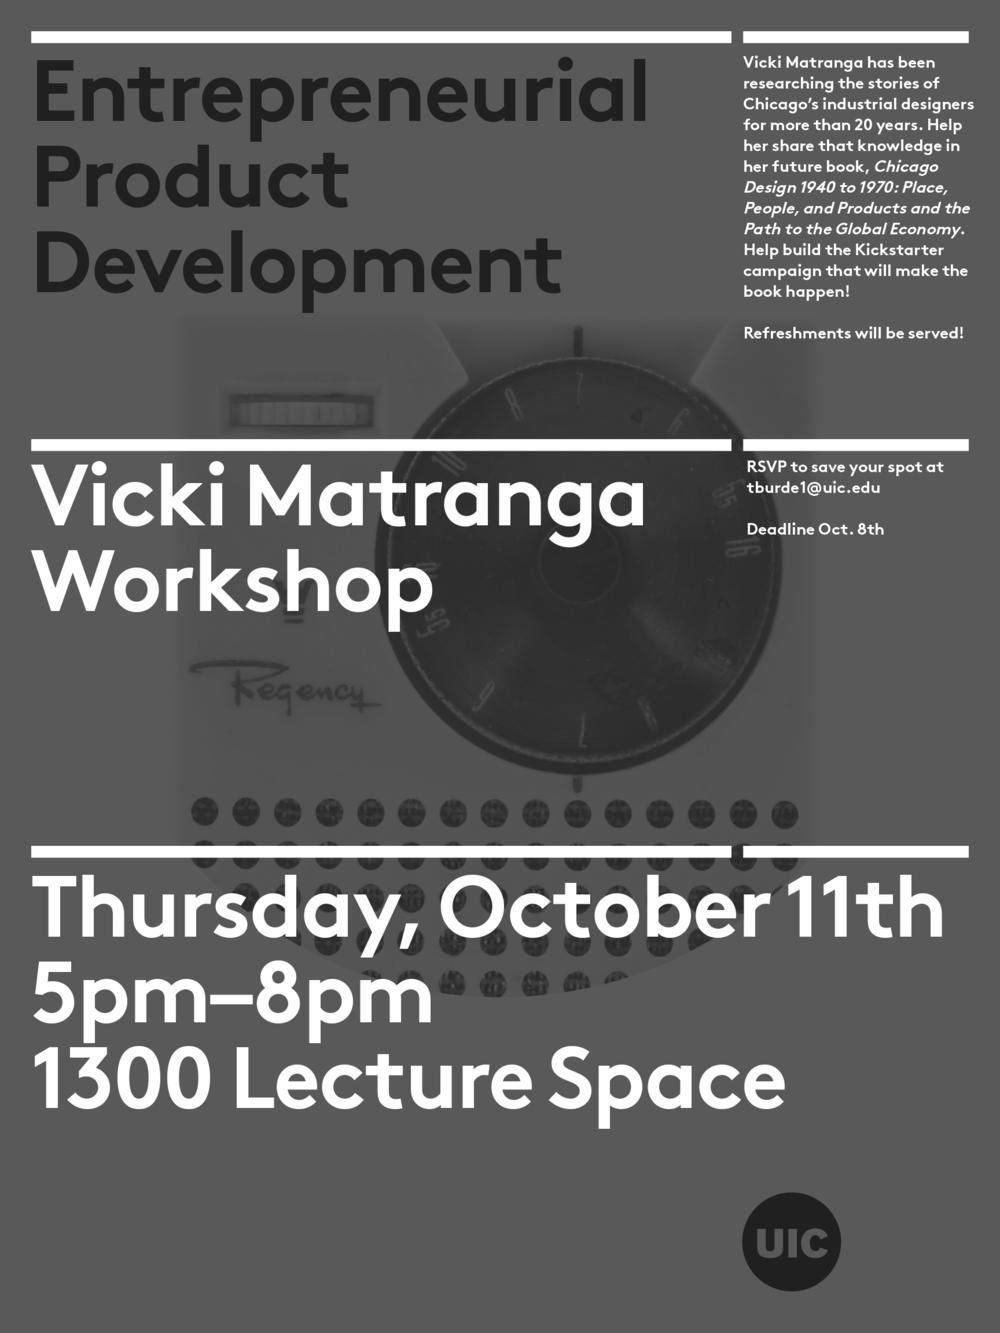 EPD_Vicki Matranga poster.png